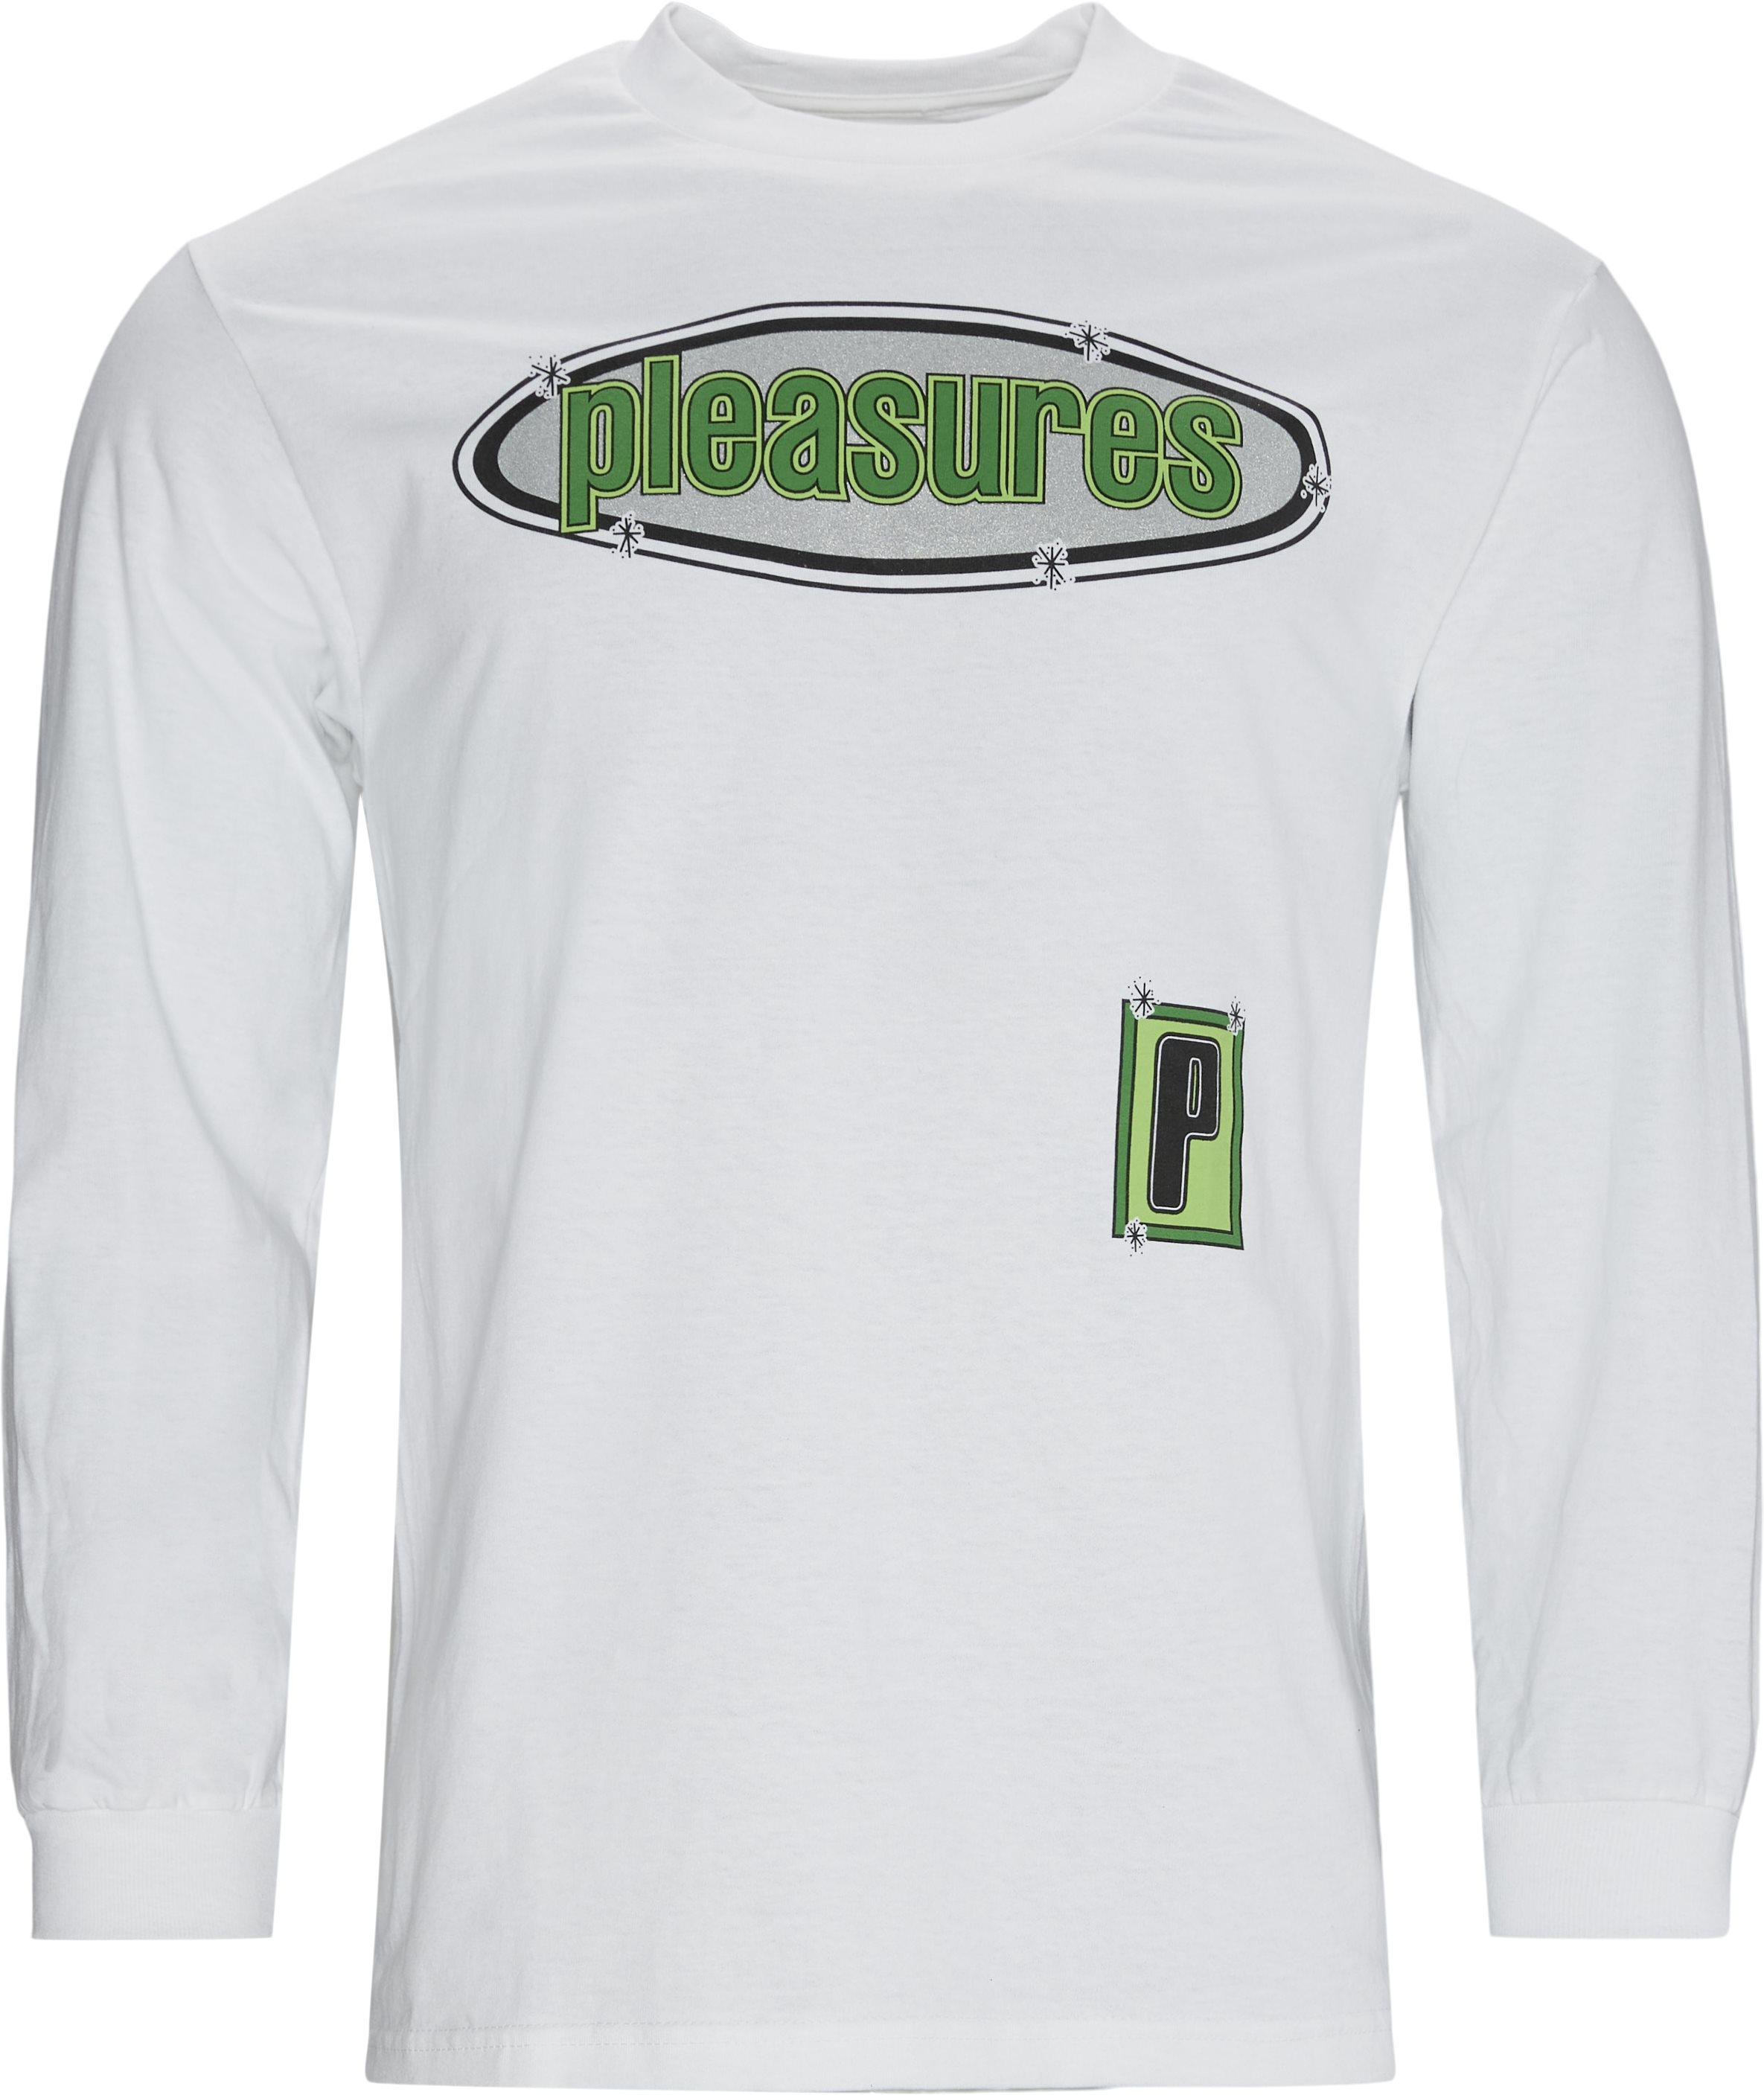 Eazy Long Sleeve Tee - T-shirts - Regular - Vit